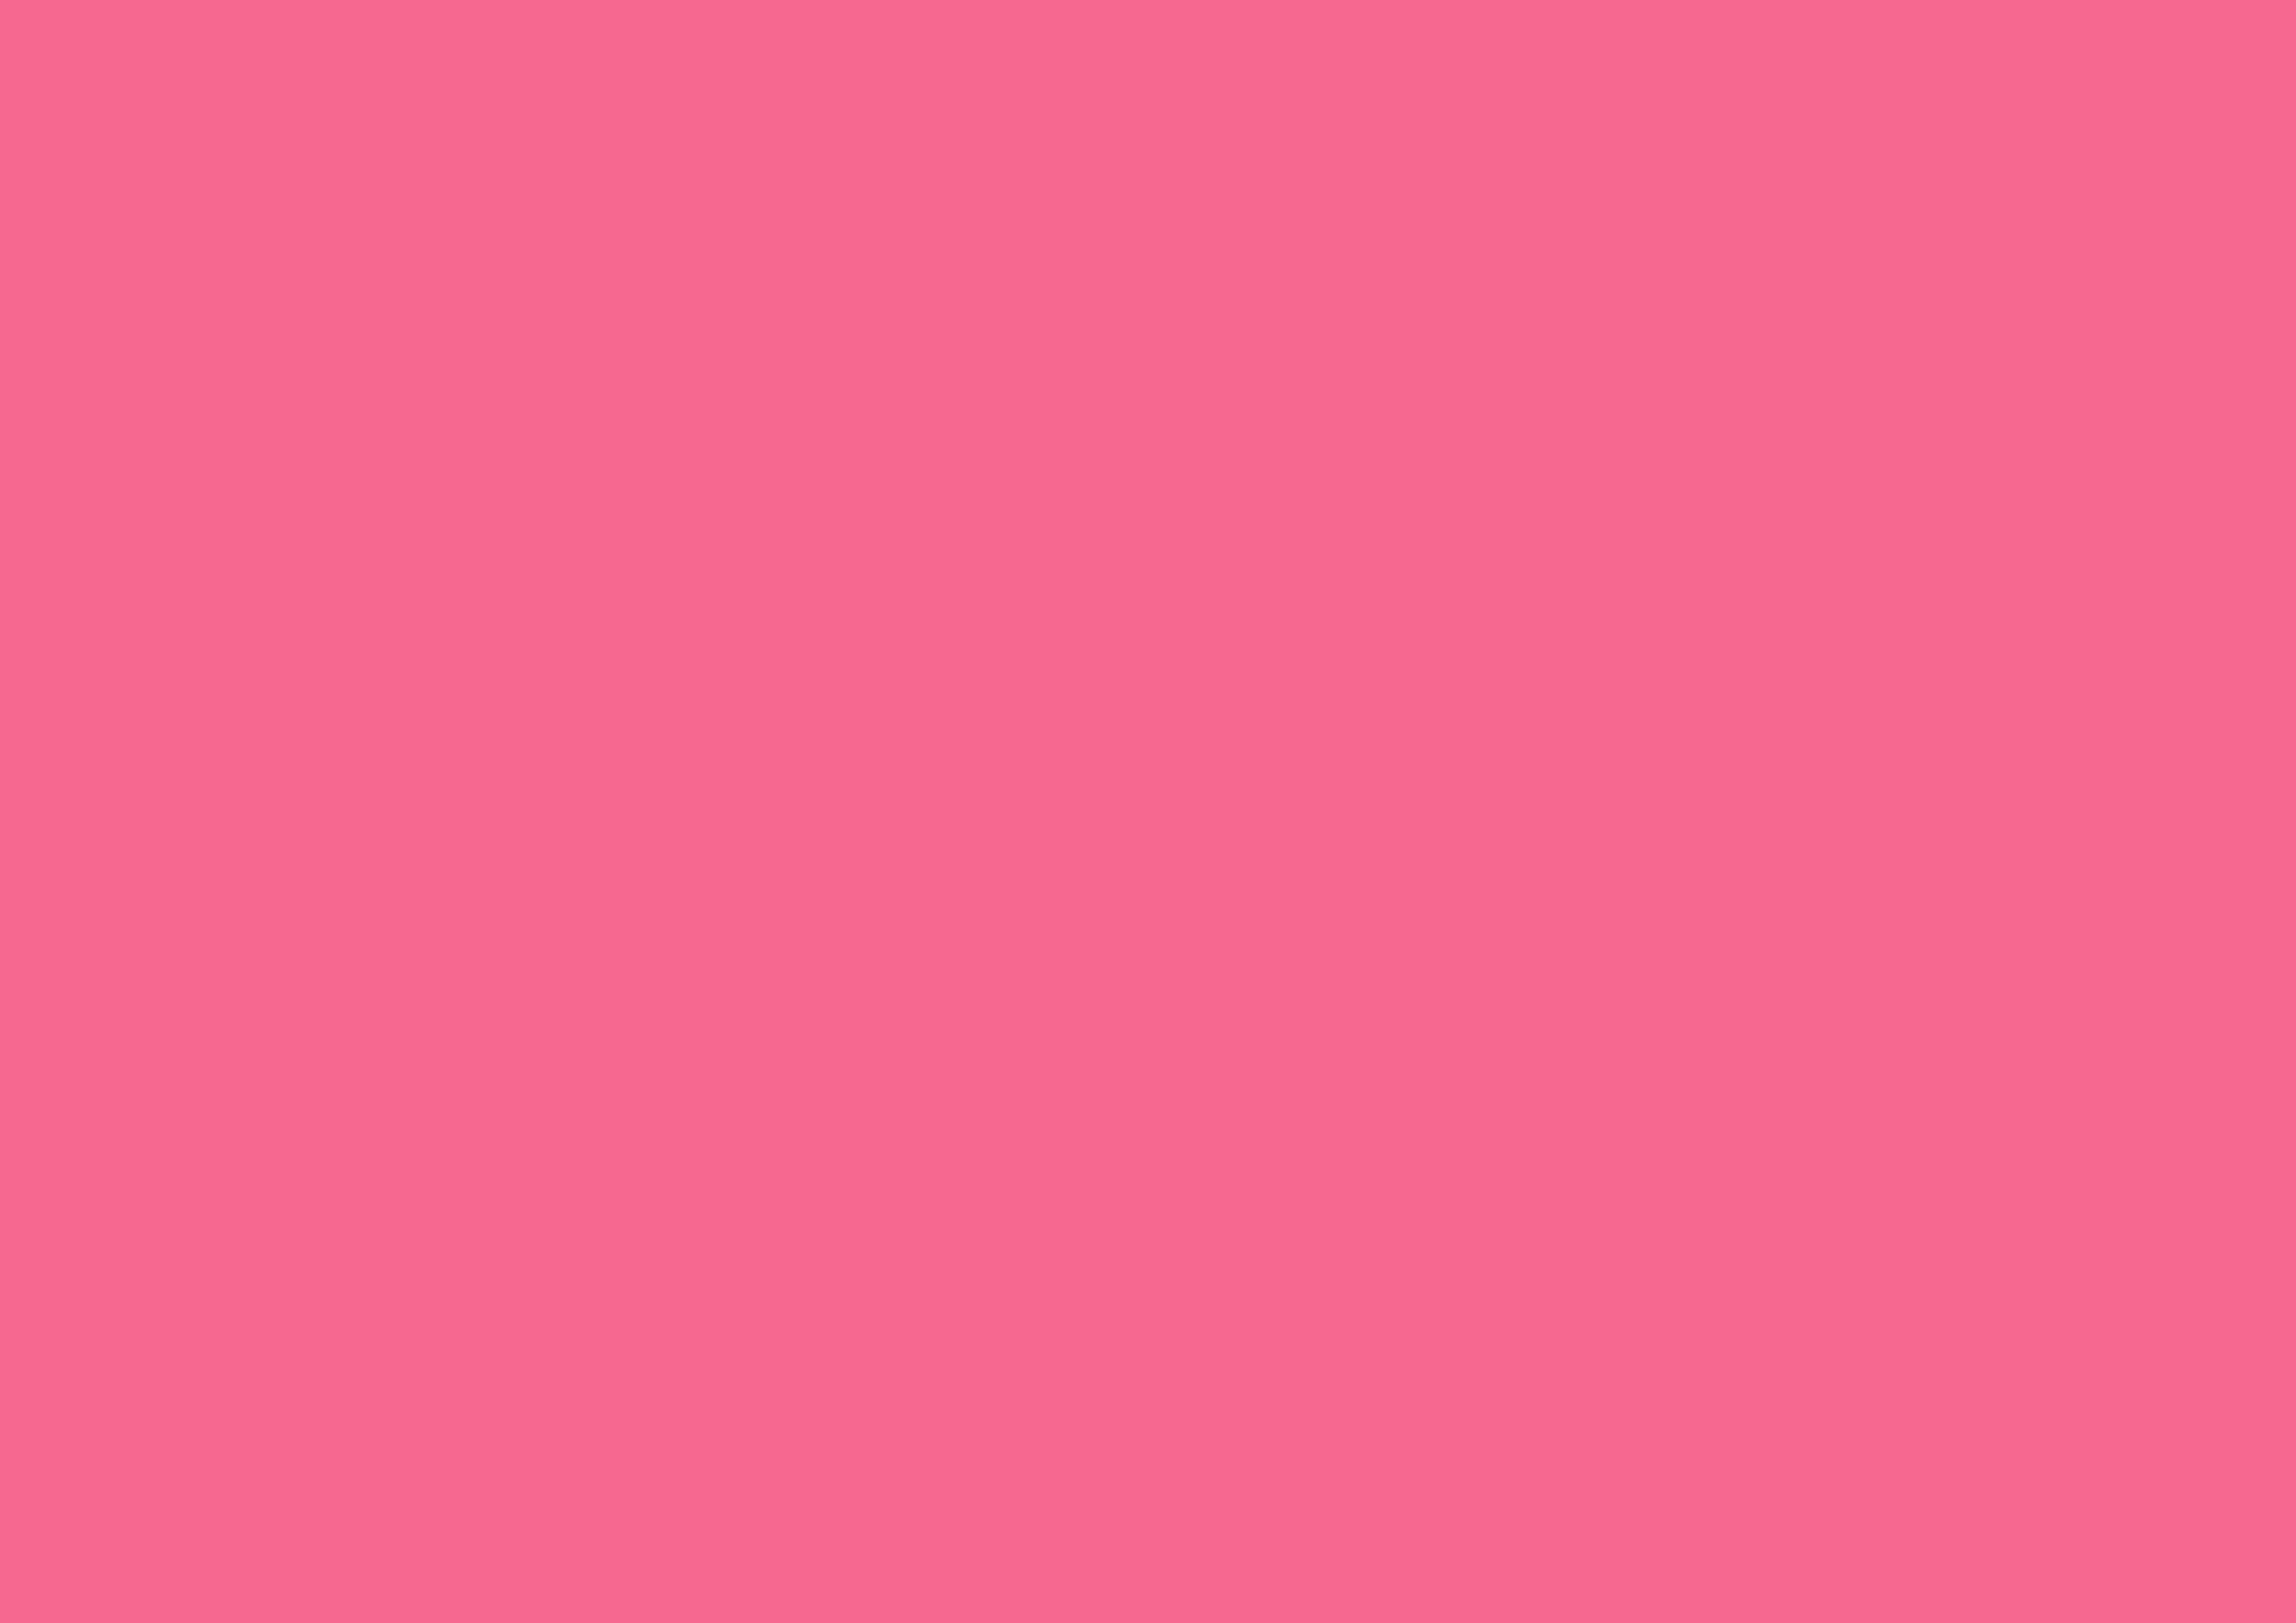 3508x2480 Light Crimson Solid Color Background